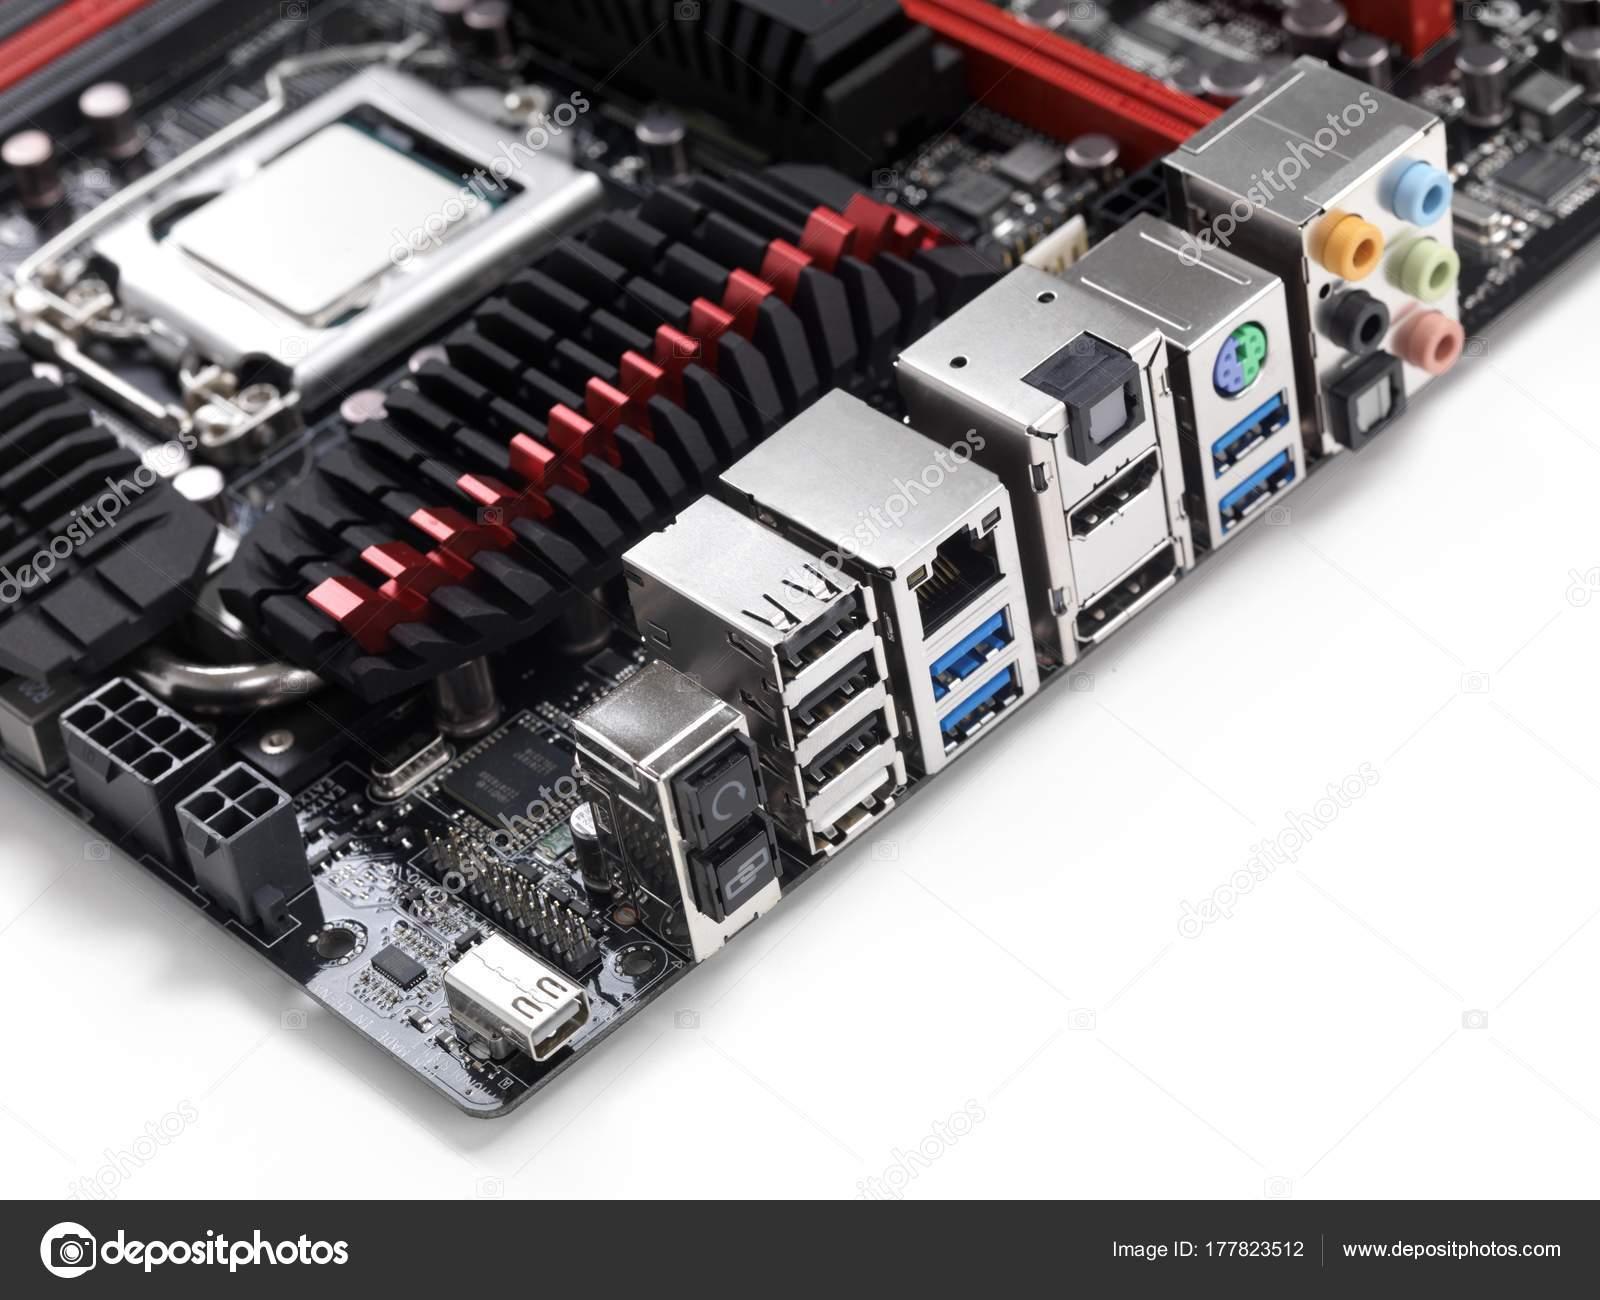 Motherboard Back Plate Connectors Including Thunderbolt Usb